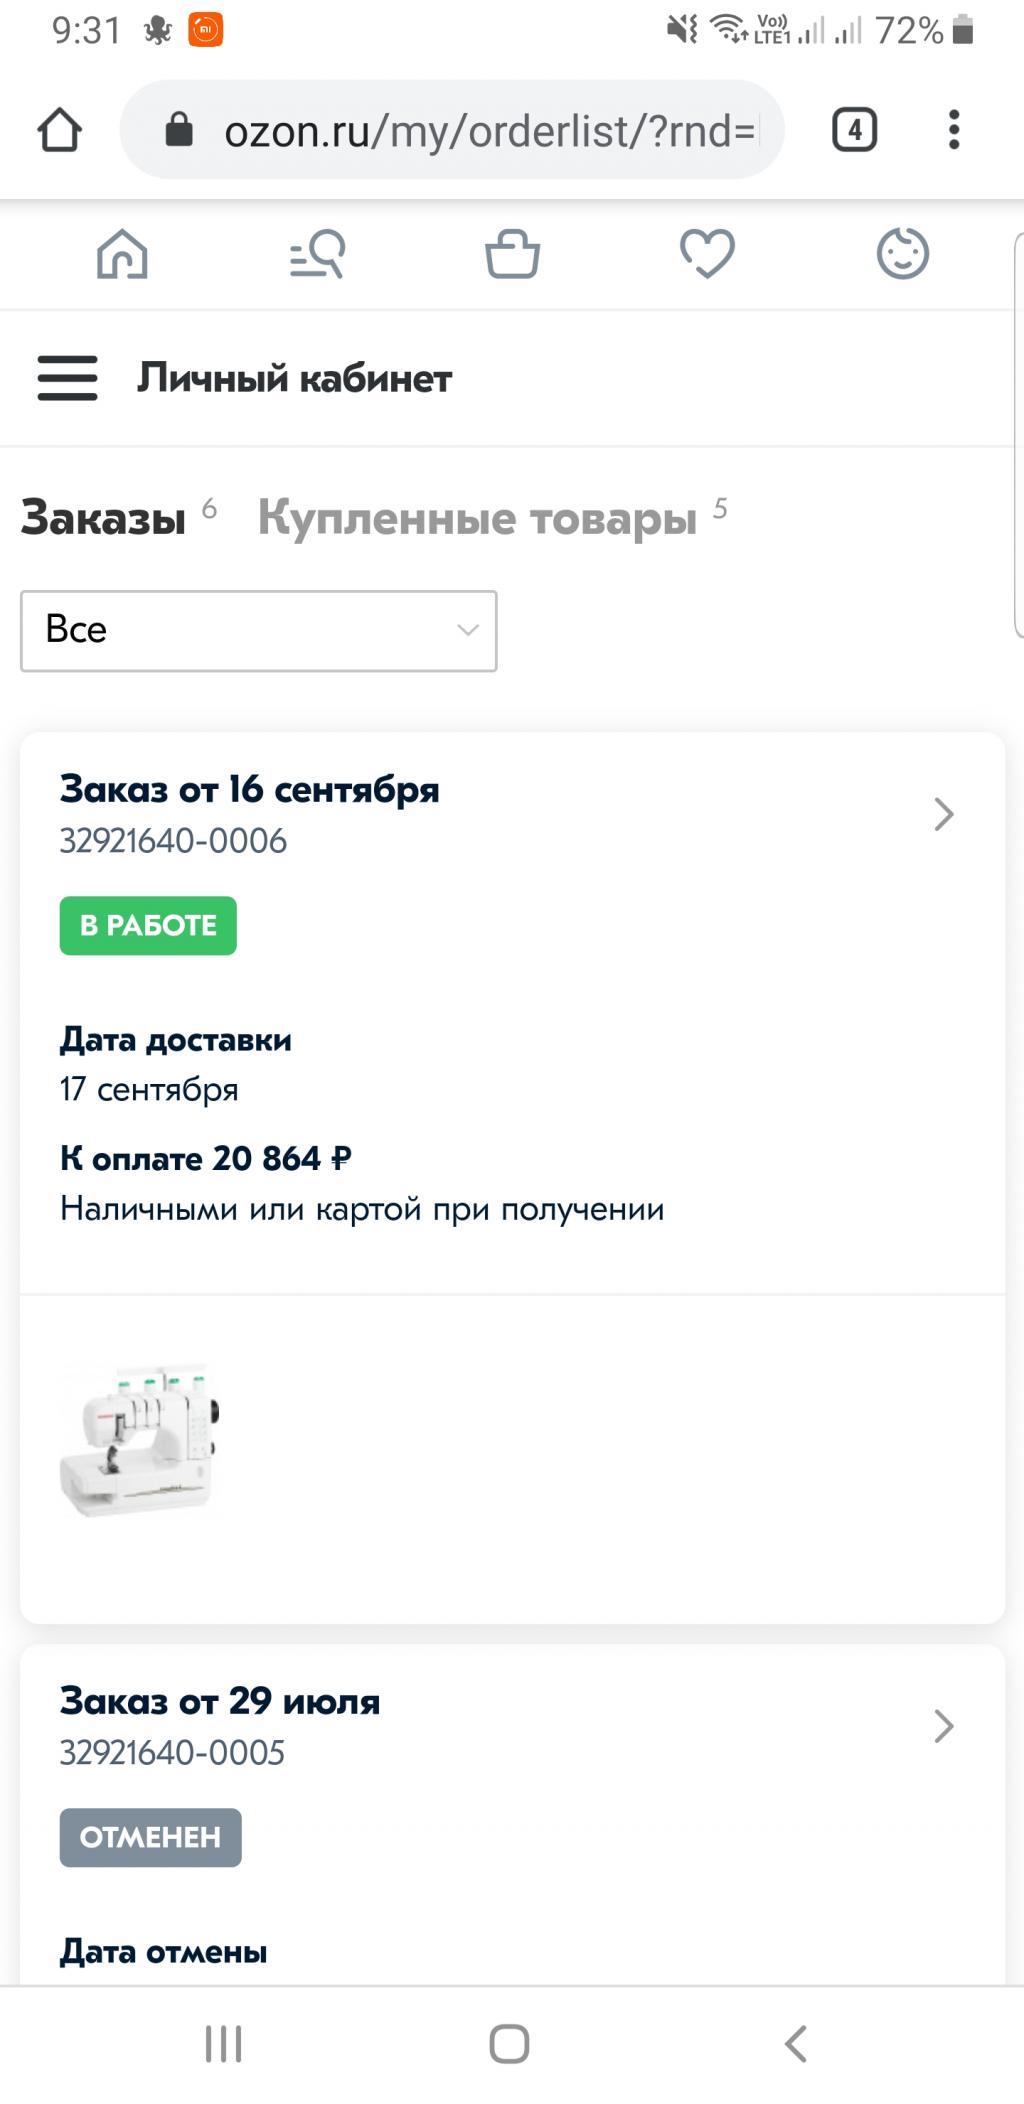 OZON.ru - Вытирают снова и снова ноги о нас, покупатели!